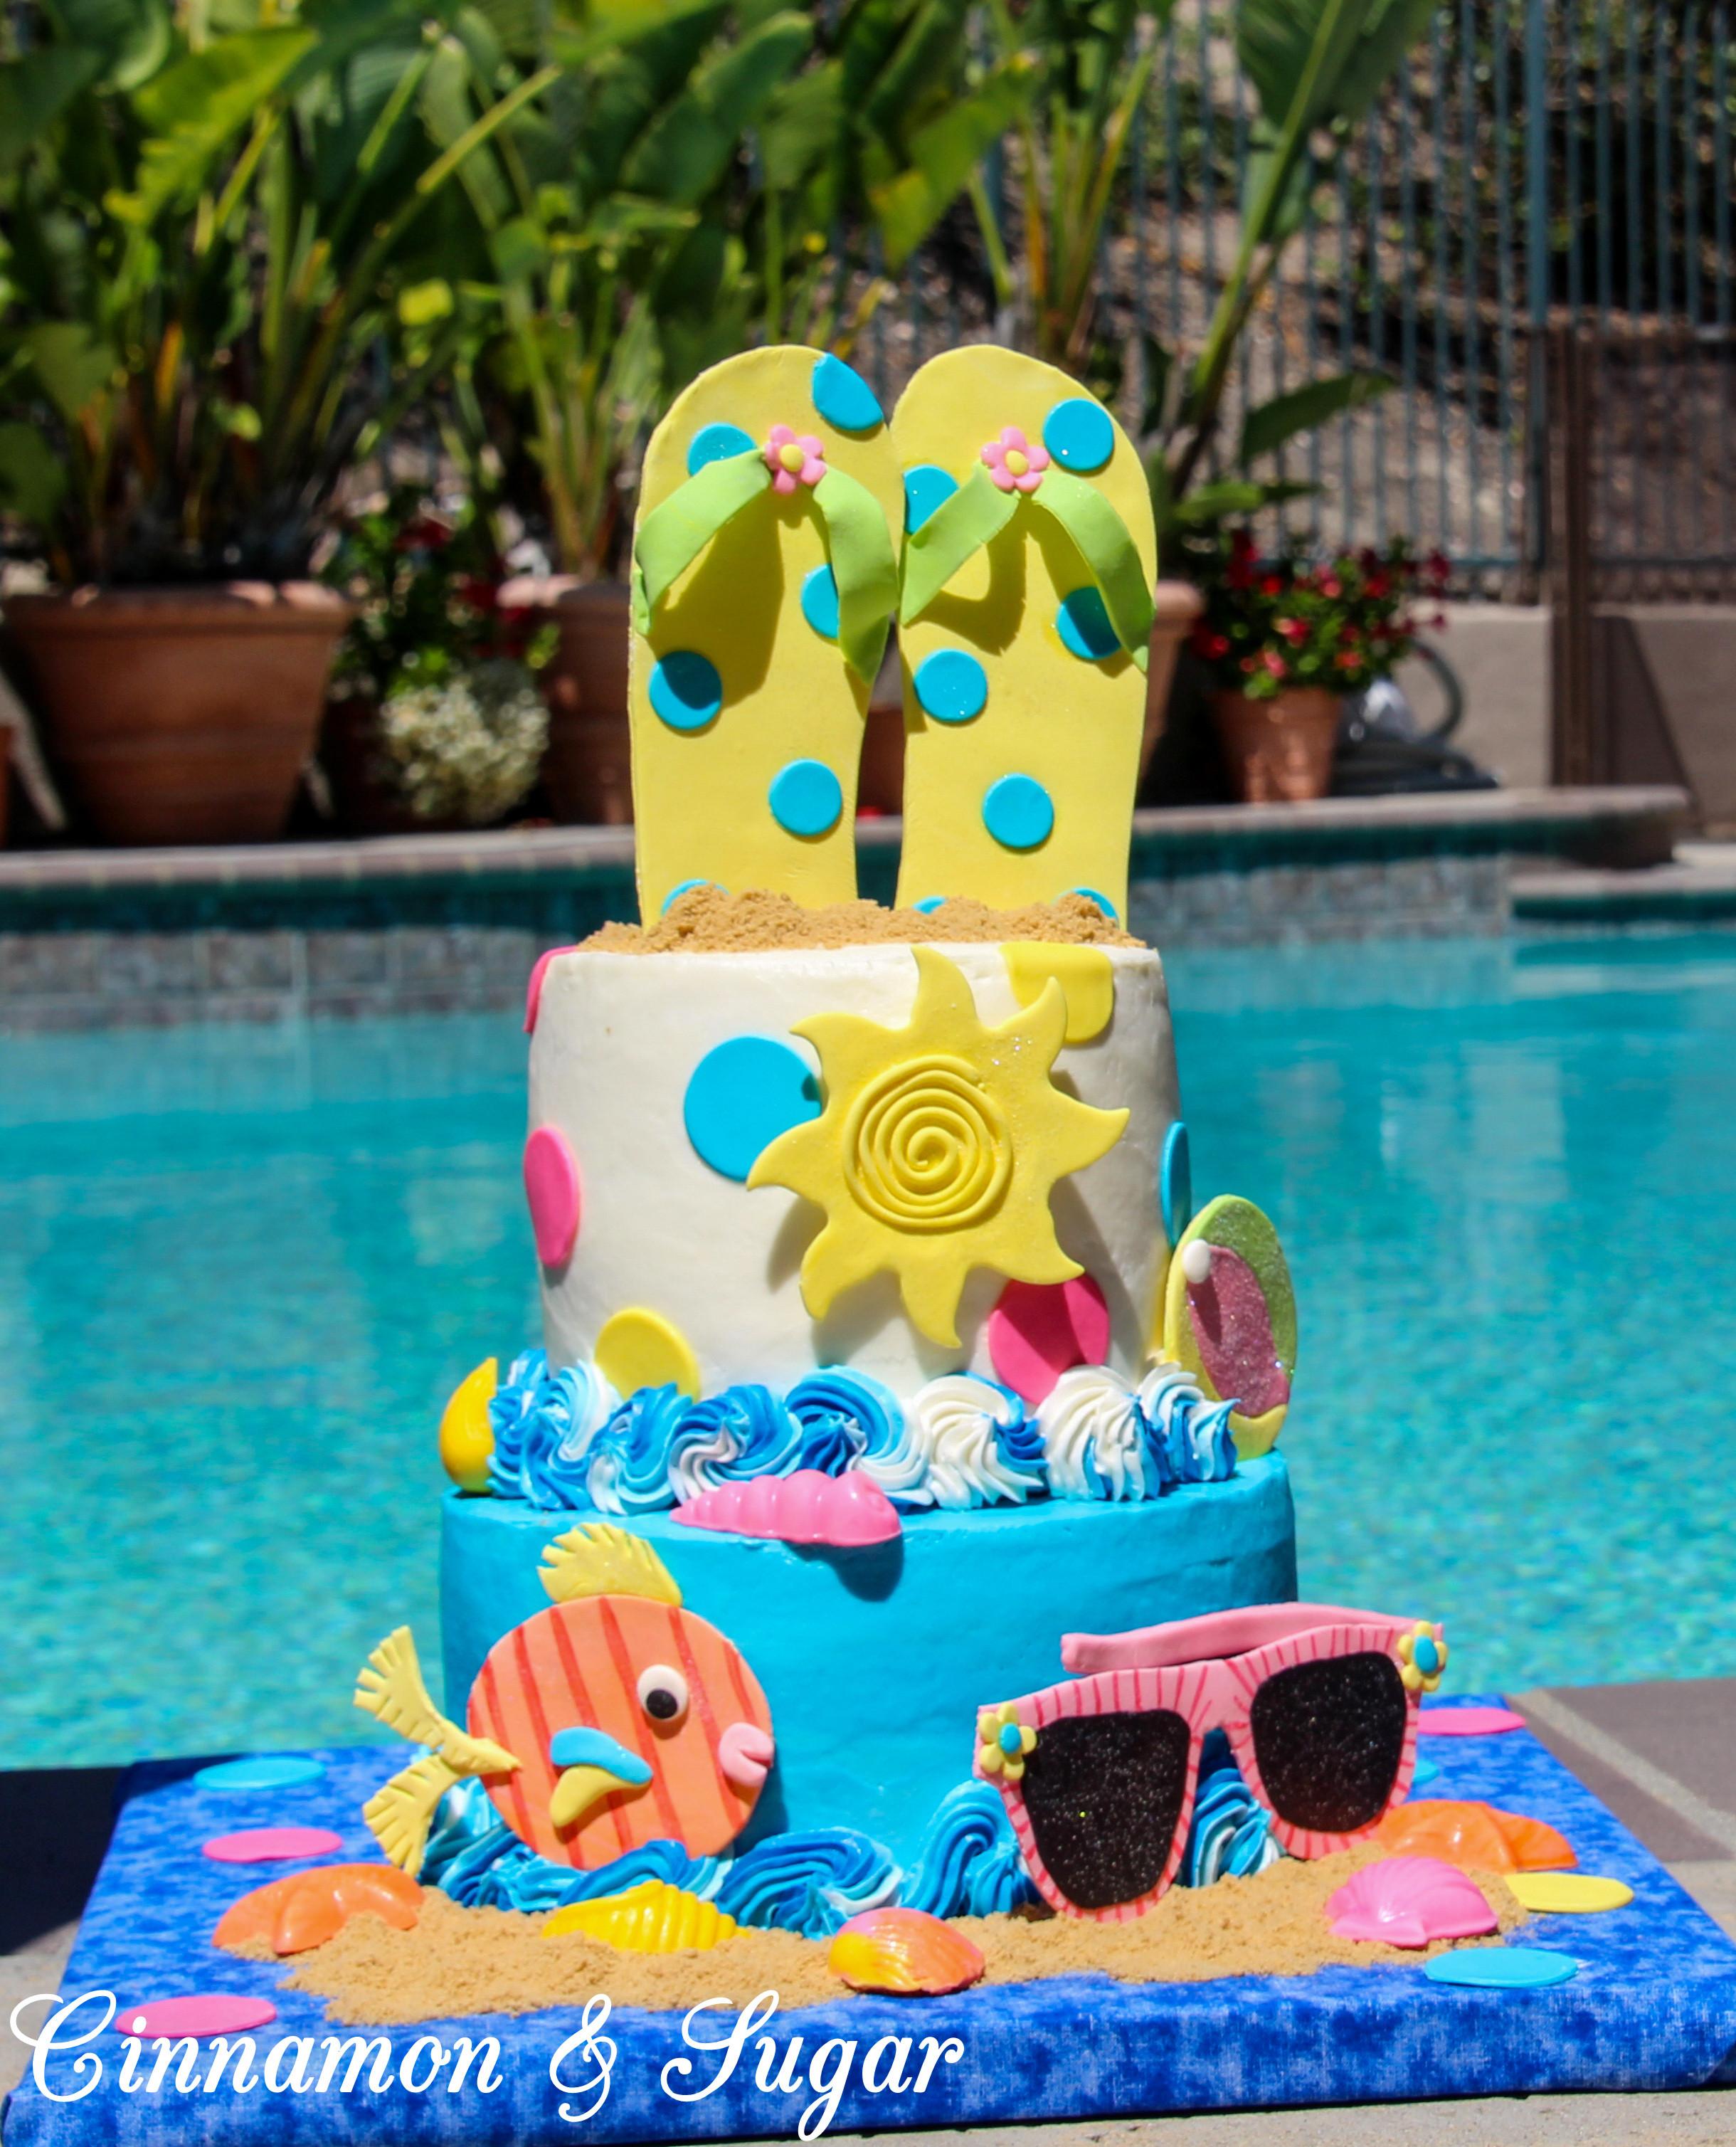 Pool Party Cake Ideas For Birthdays  17 Tricks to Make a Boxed Cake Mix Taste Like Homemade